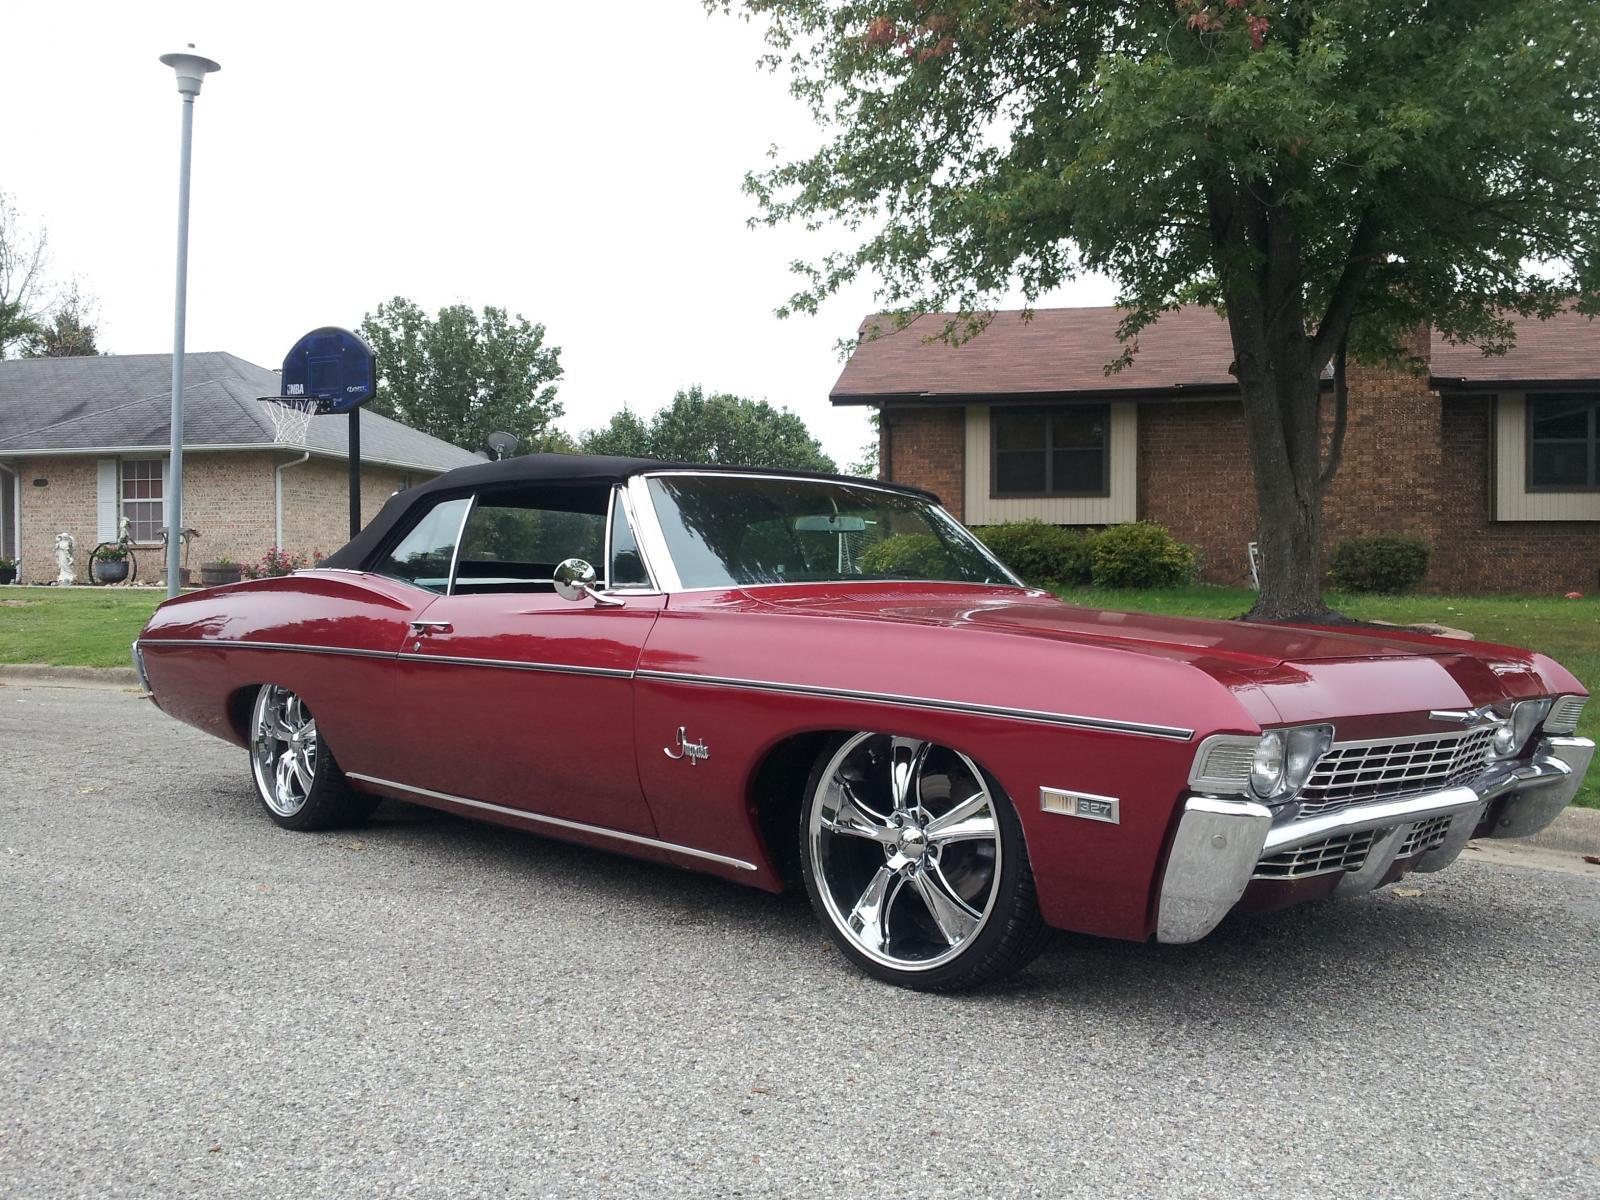 68 Impala Slammed